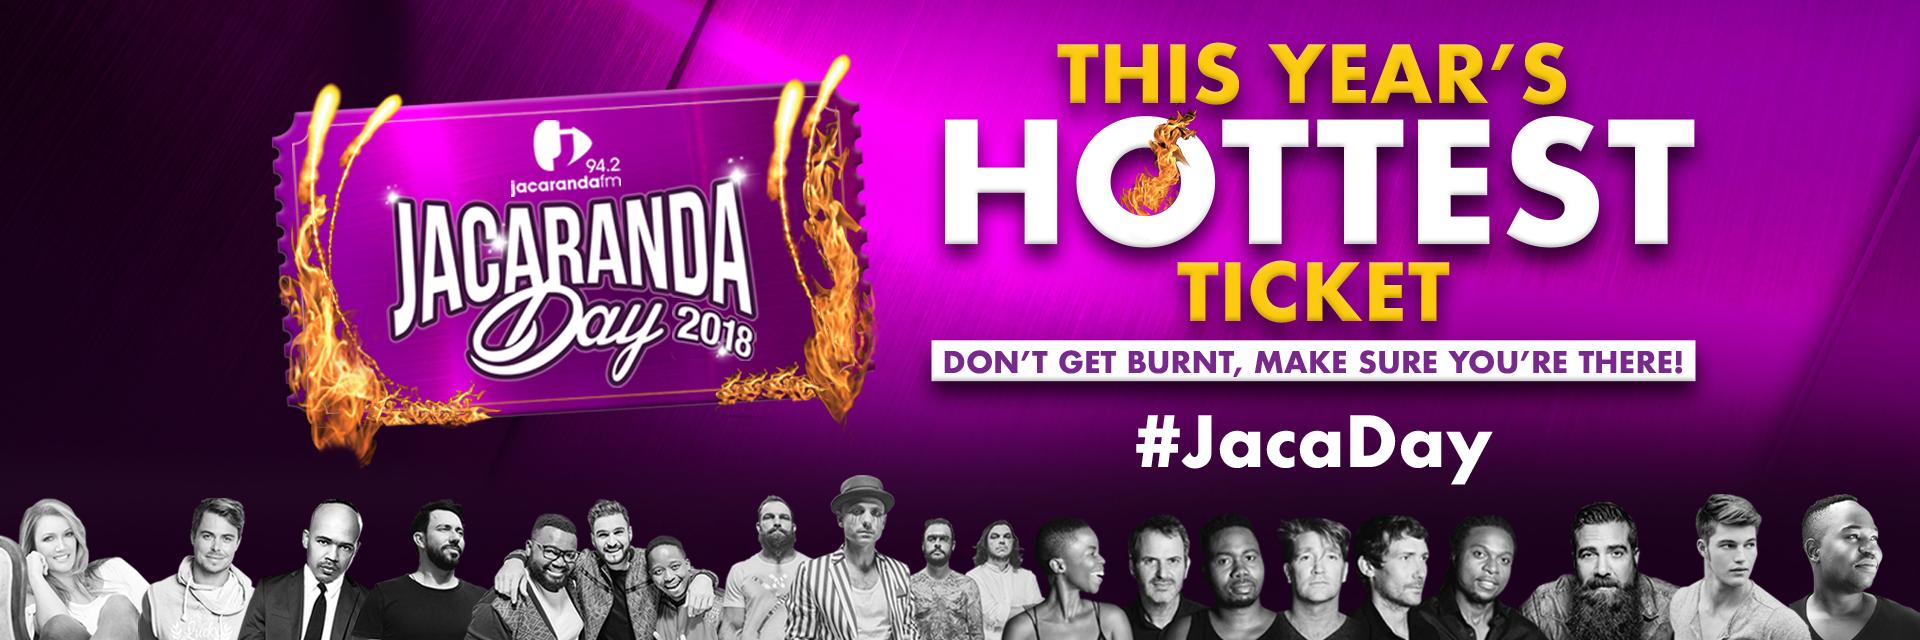 jacaday header 2018